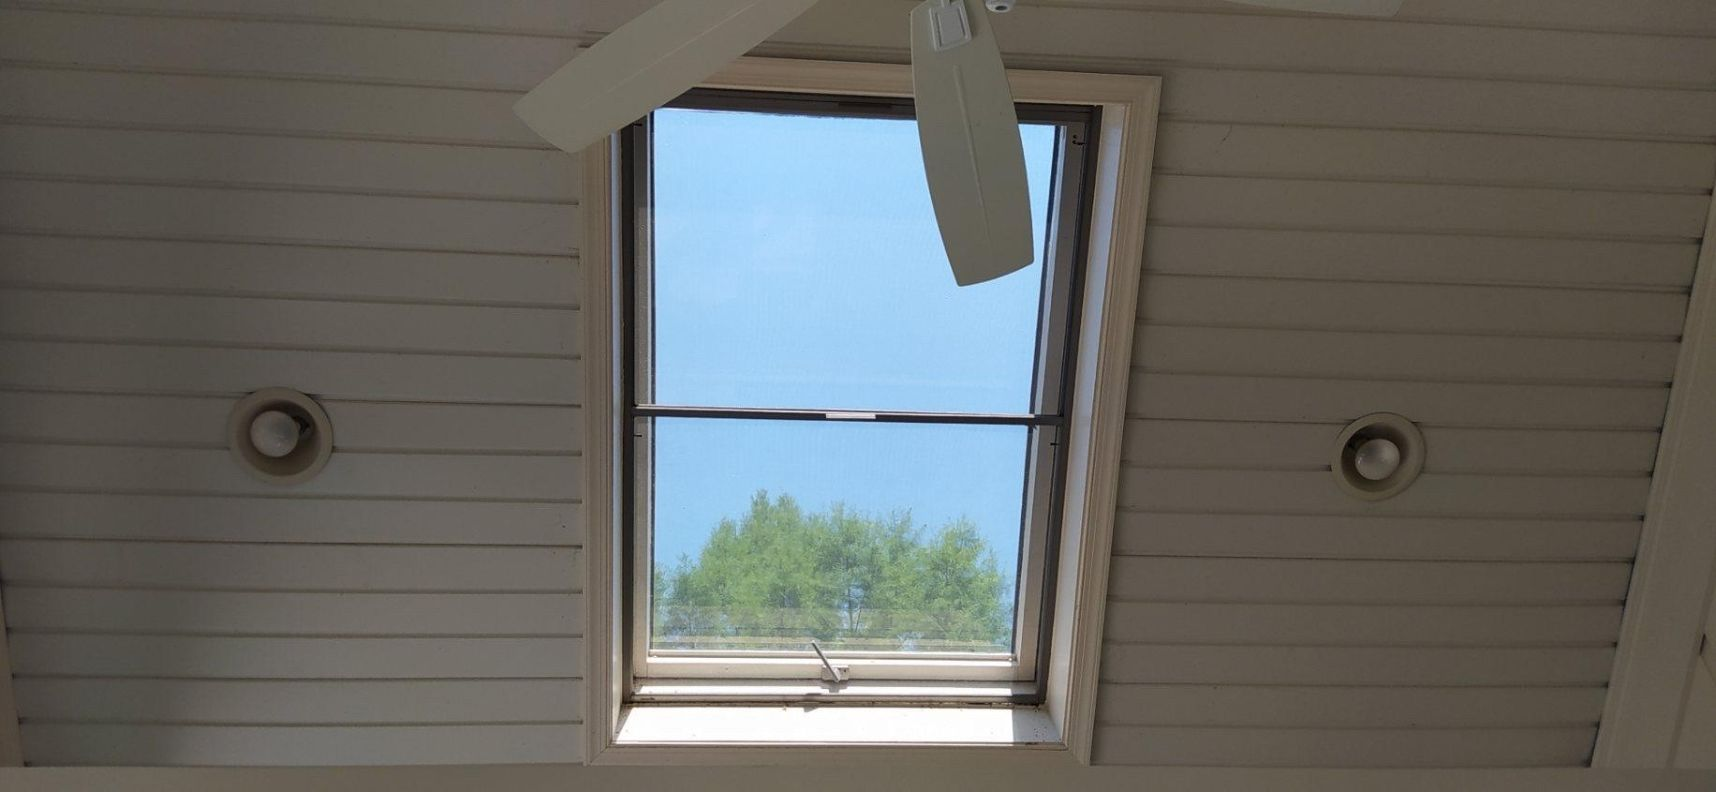 Night vision window film installed to skylight